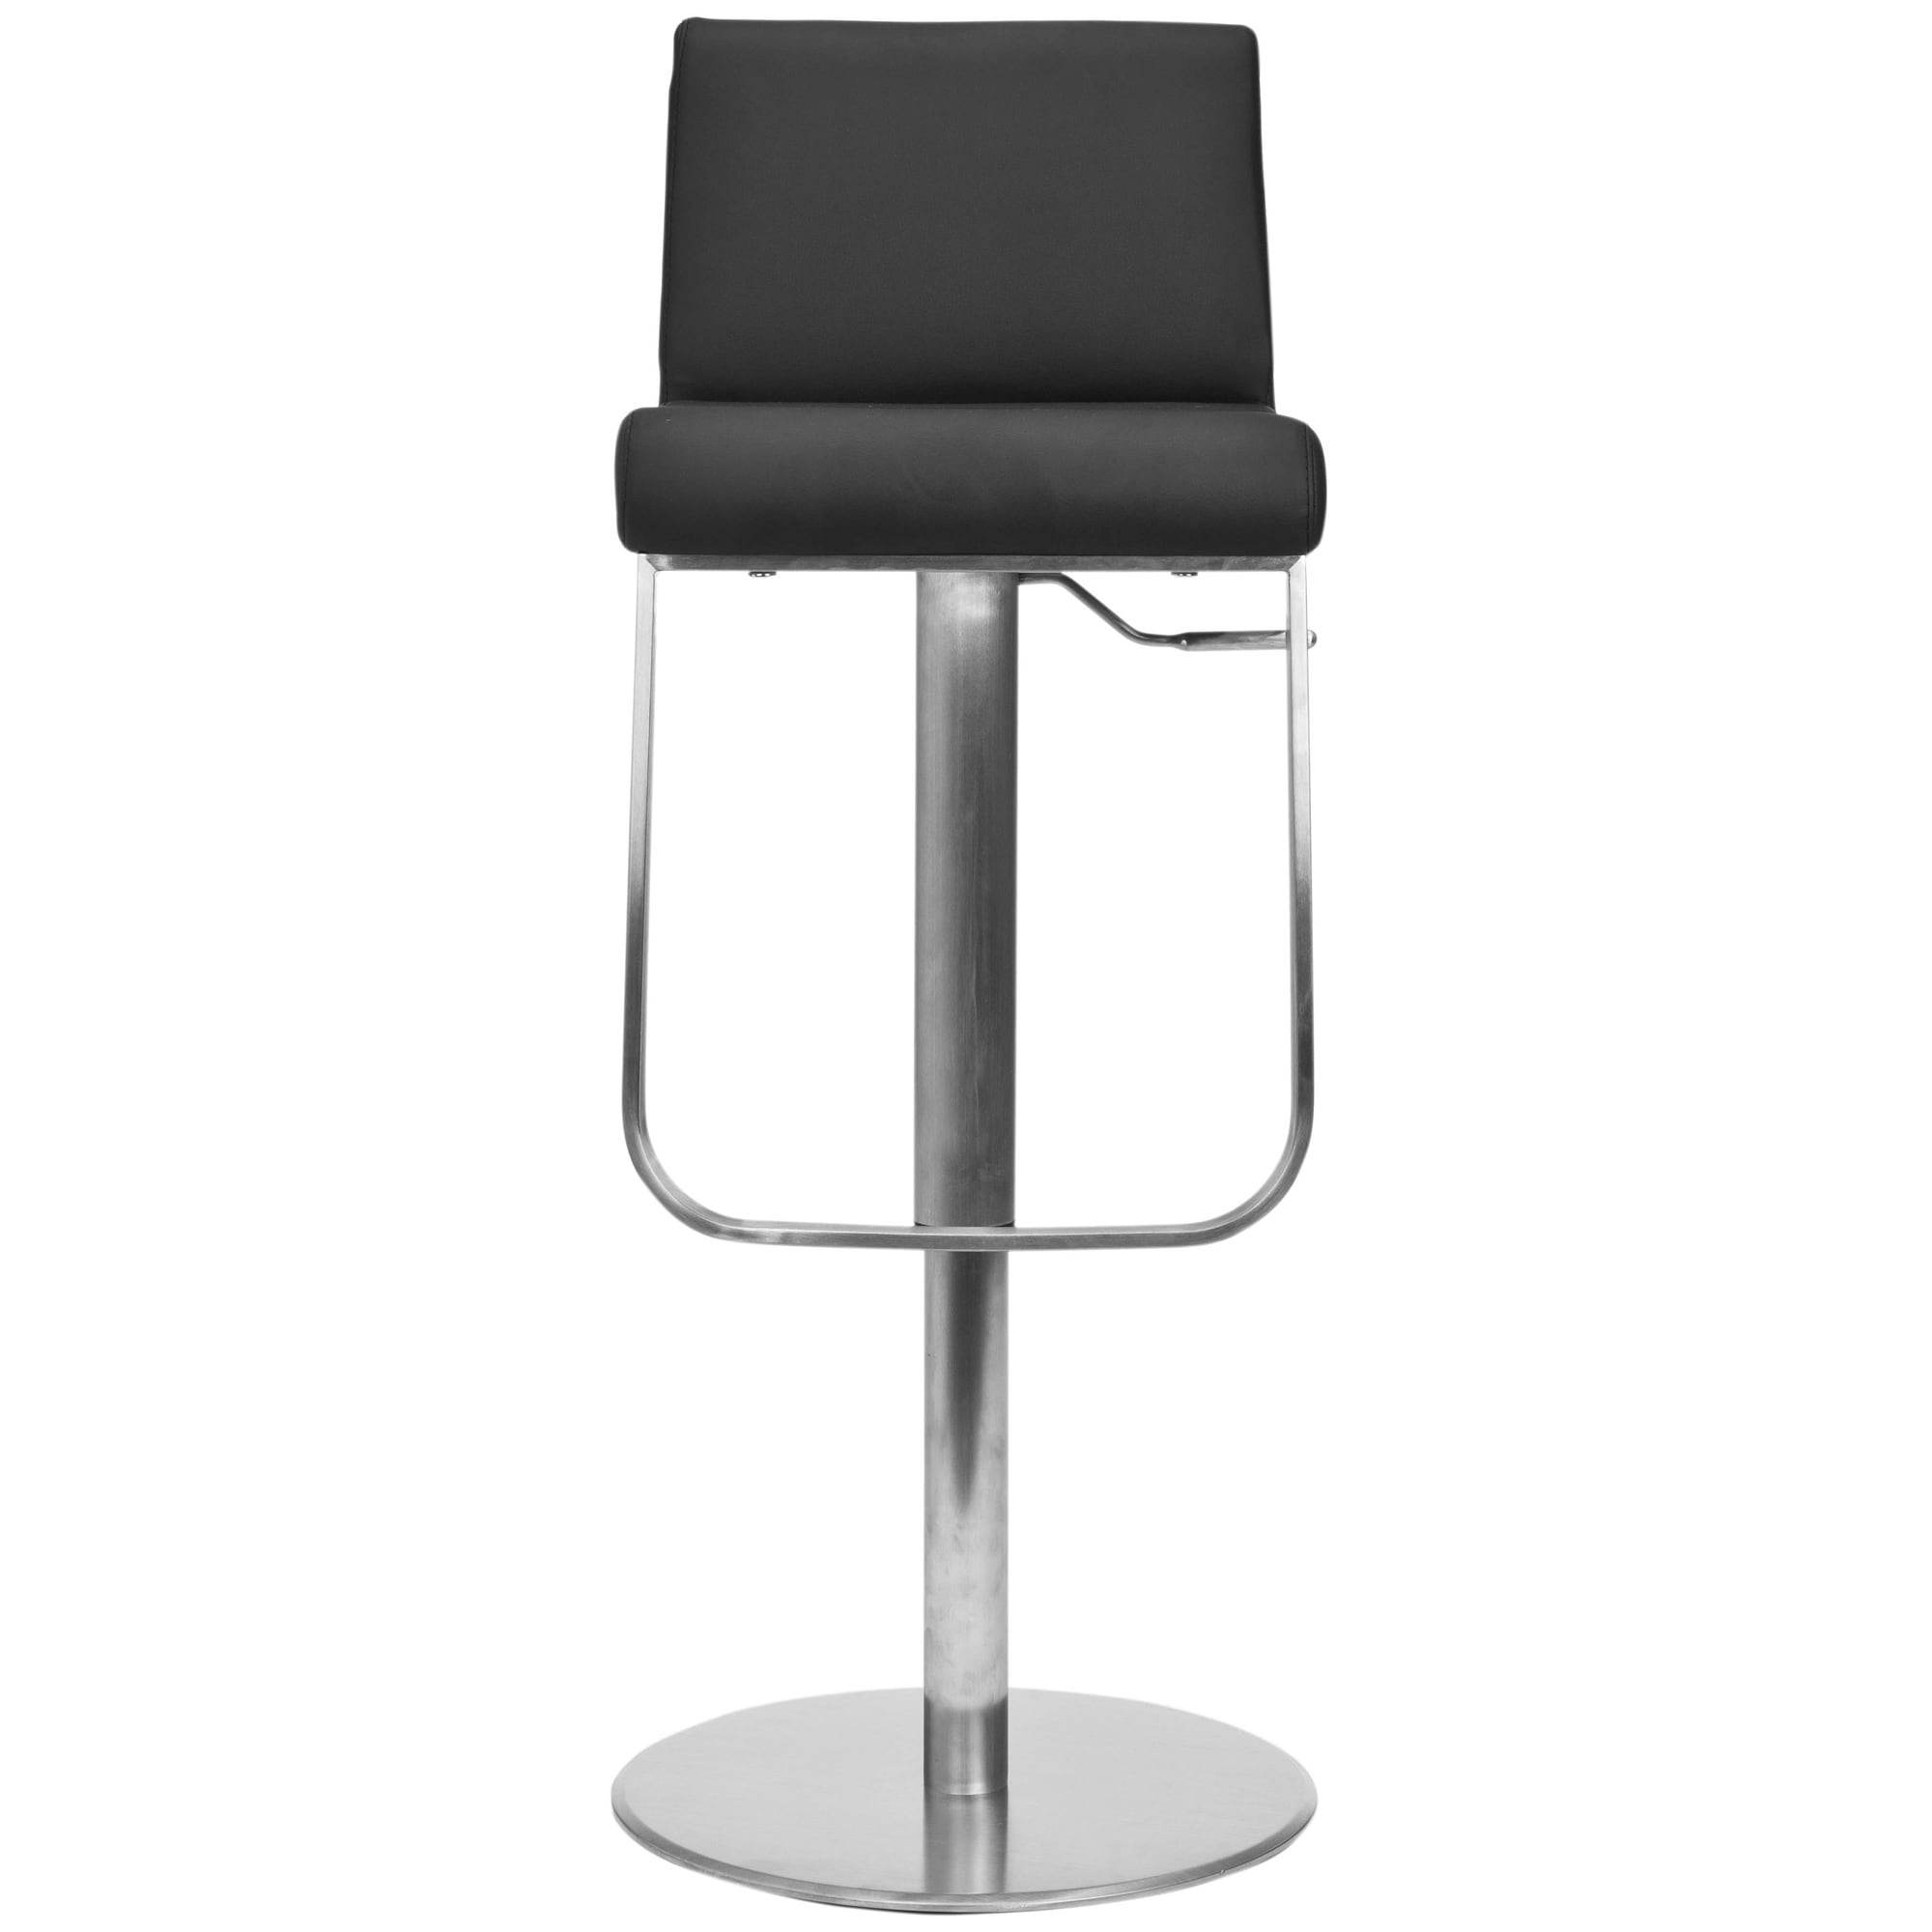 Tremendous Safavieh Stanley Black Leather Adjustable 24 33 Inch Swivel Modern Bar Stool 19 3 X 16 5 X 32 7 Ibusinesslaw Wood Chair Design Ideas Ibusinesslaworg